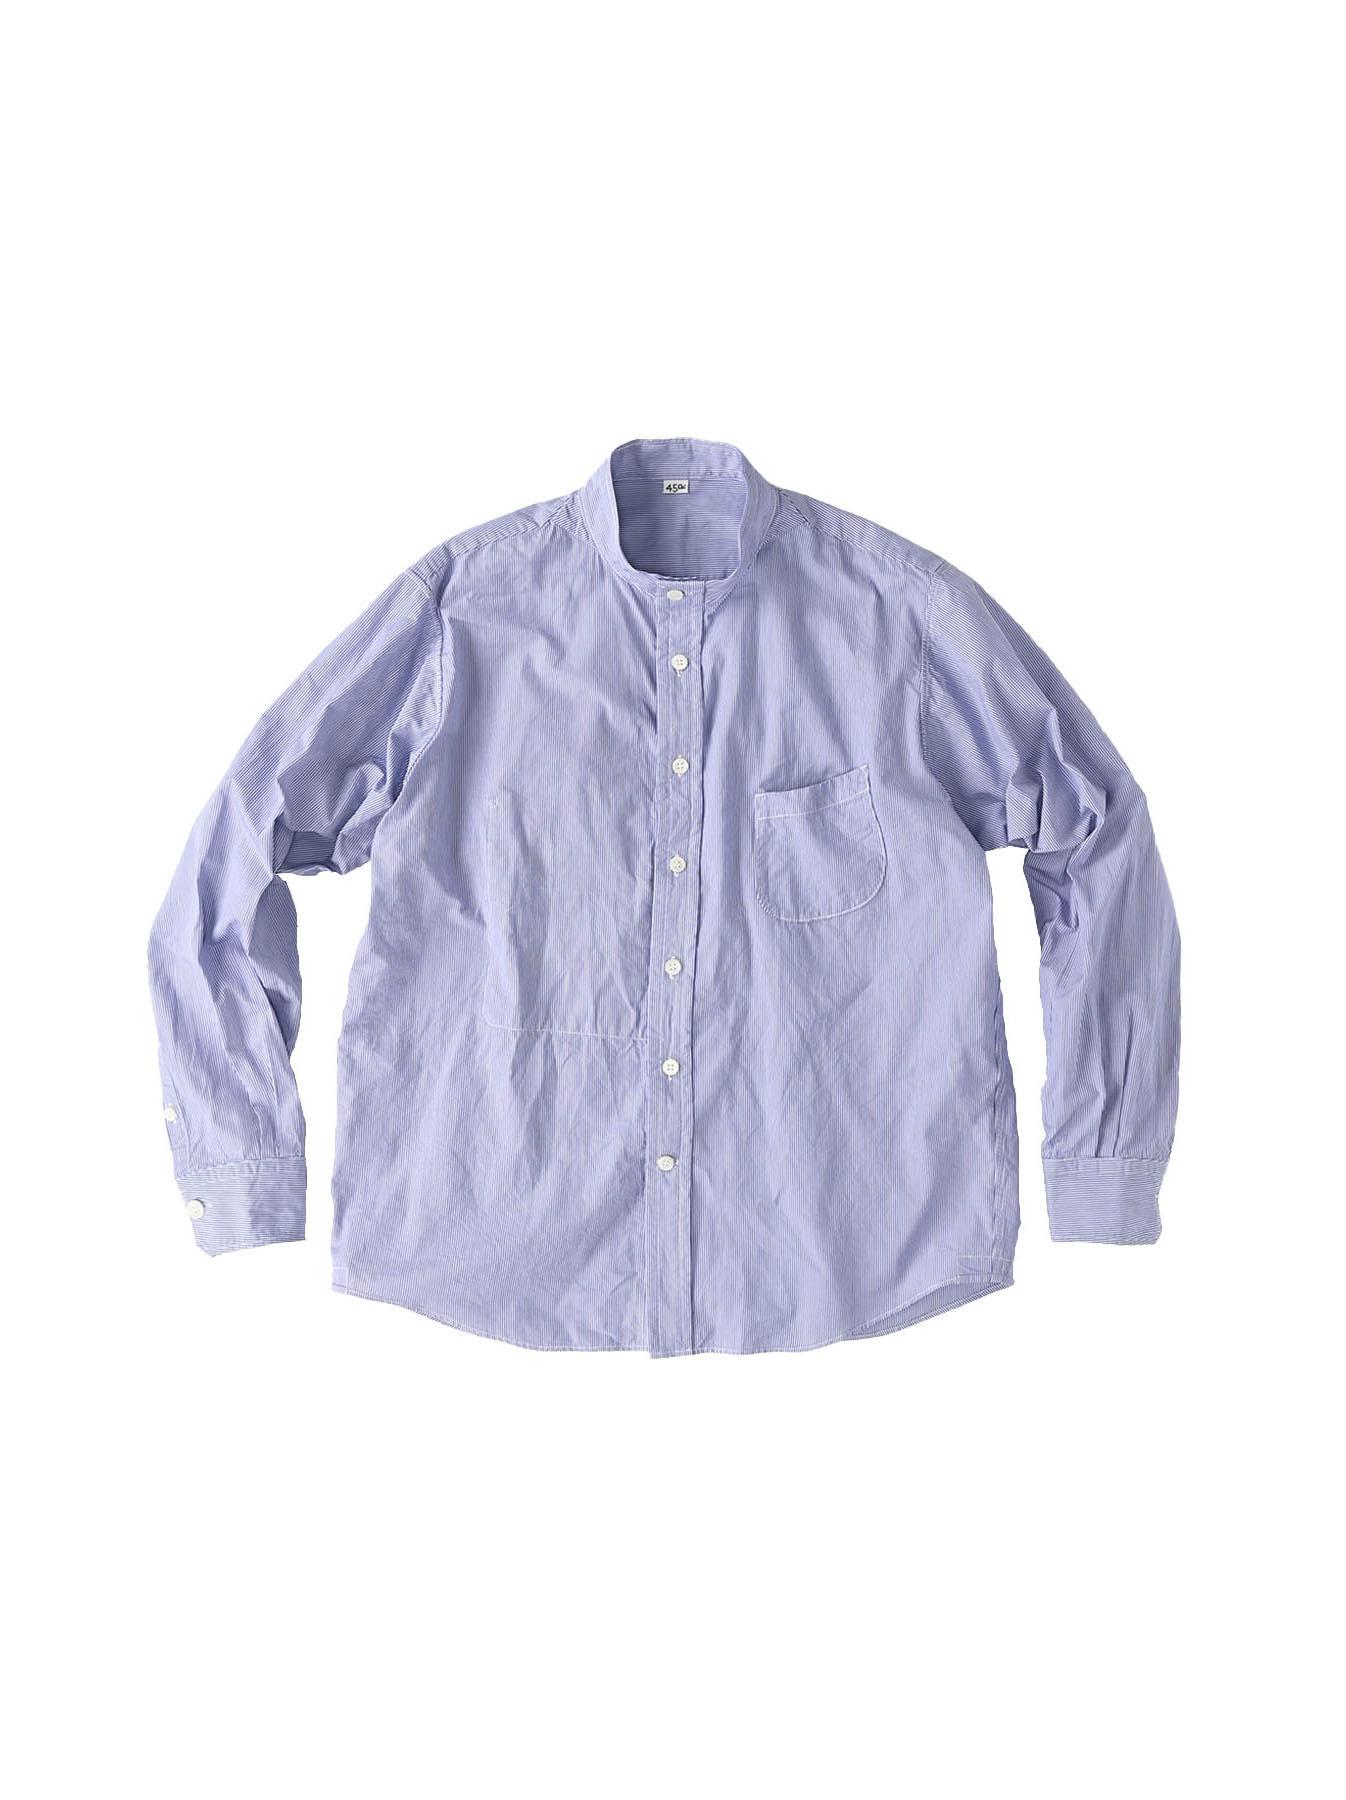 Miko Stand Collar 908 Ocean Shirt-3